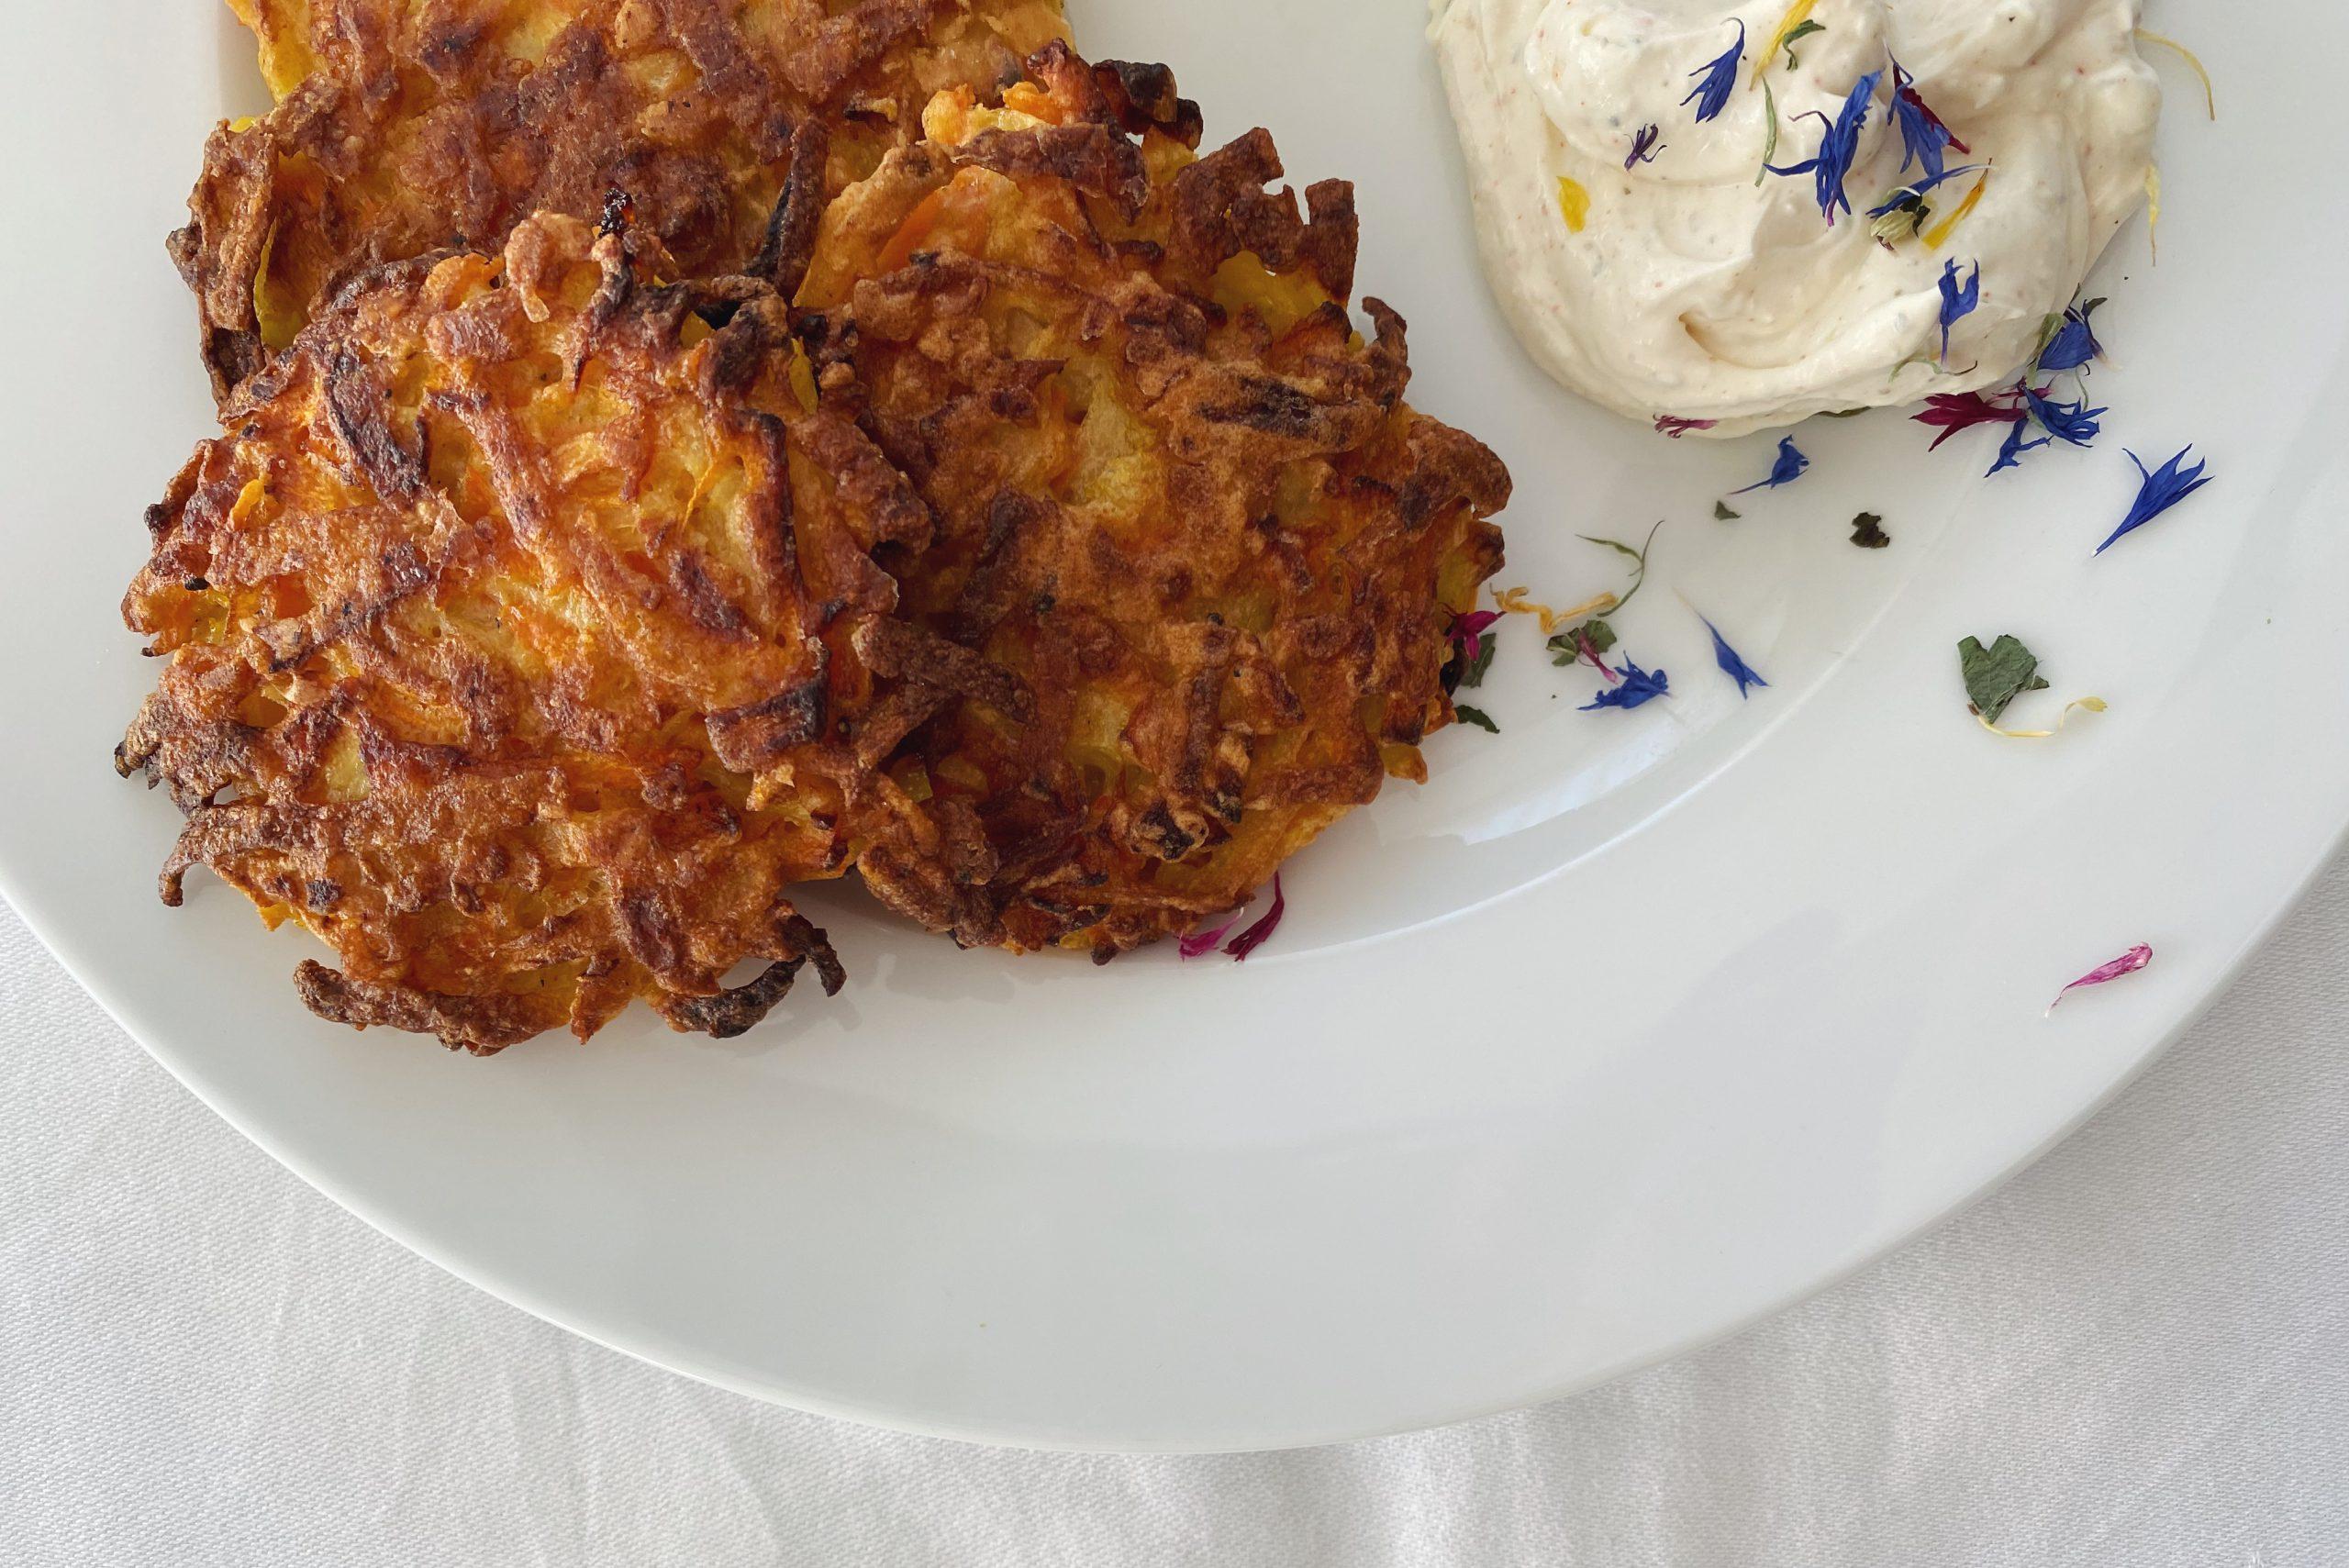 Kartoffel-Rüebli-Tätschli mit Kräuterquark